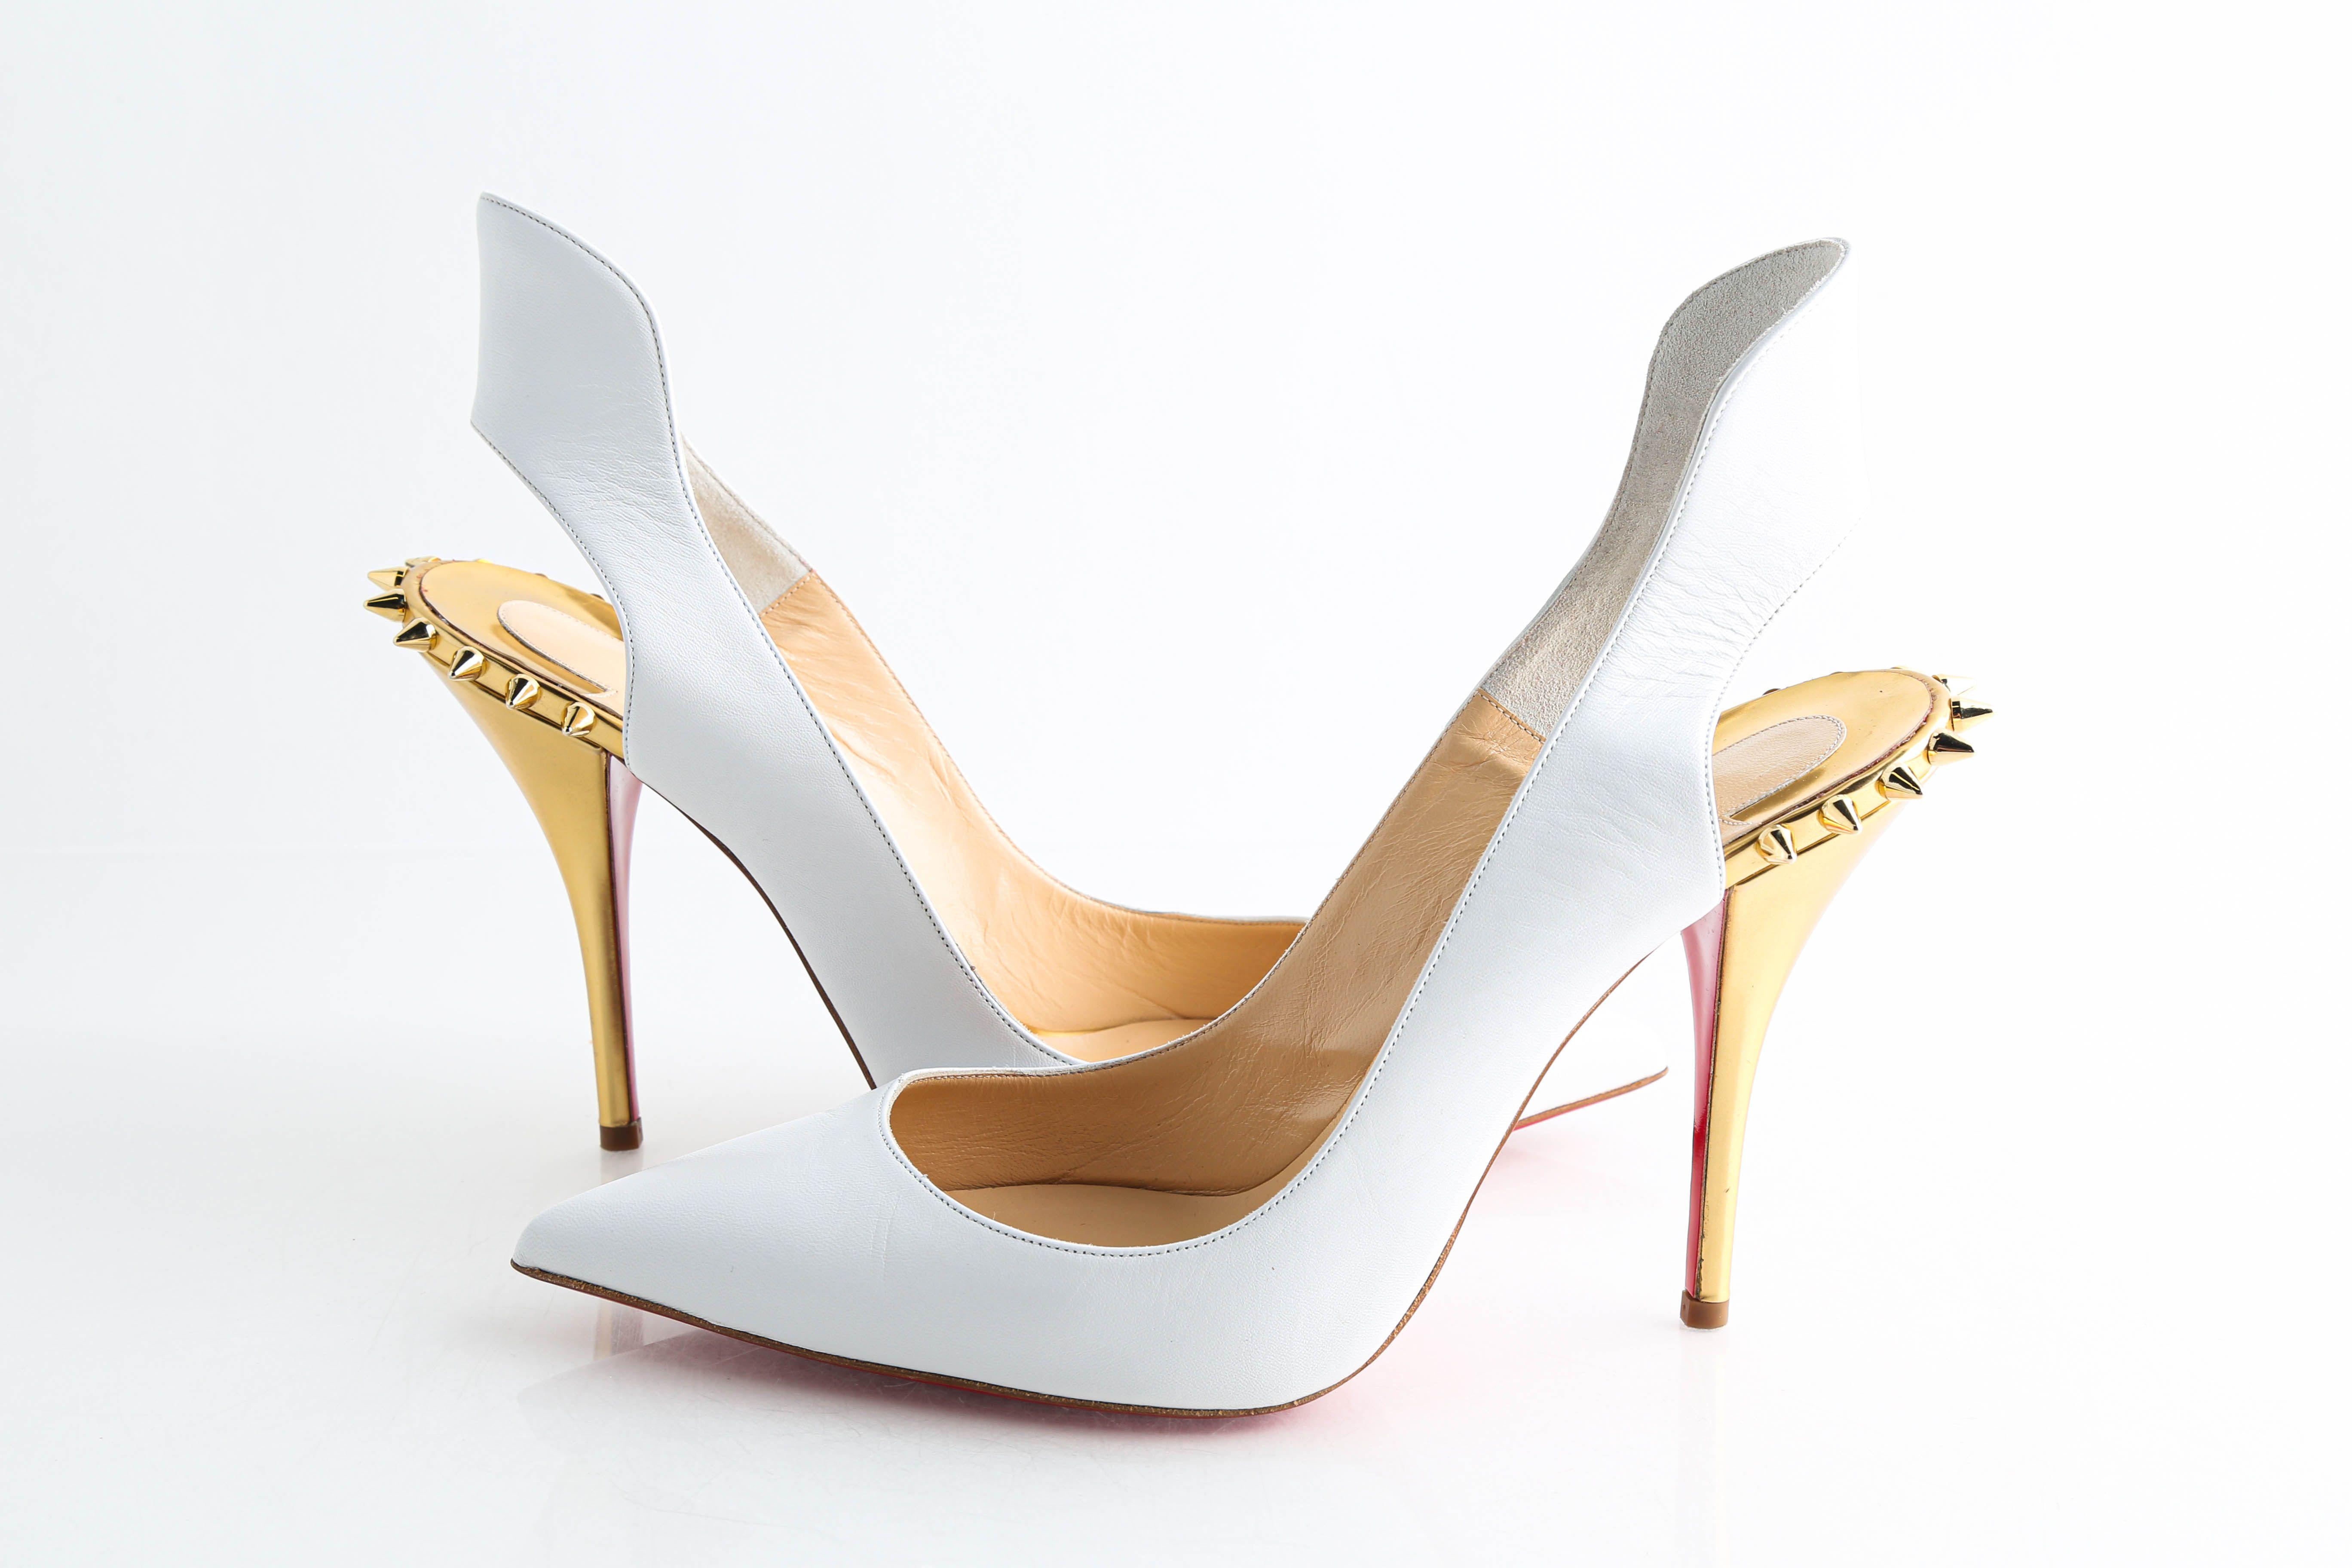 Gold Survivita 100 Dress Heels Pumps